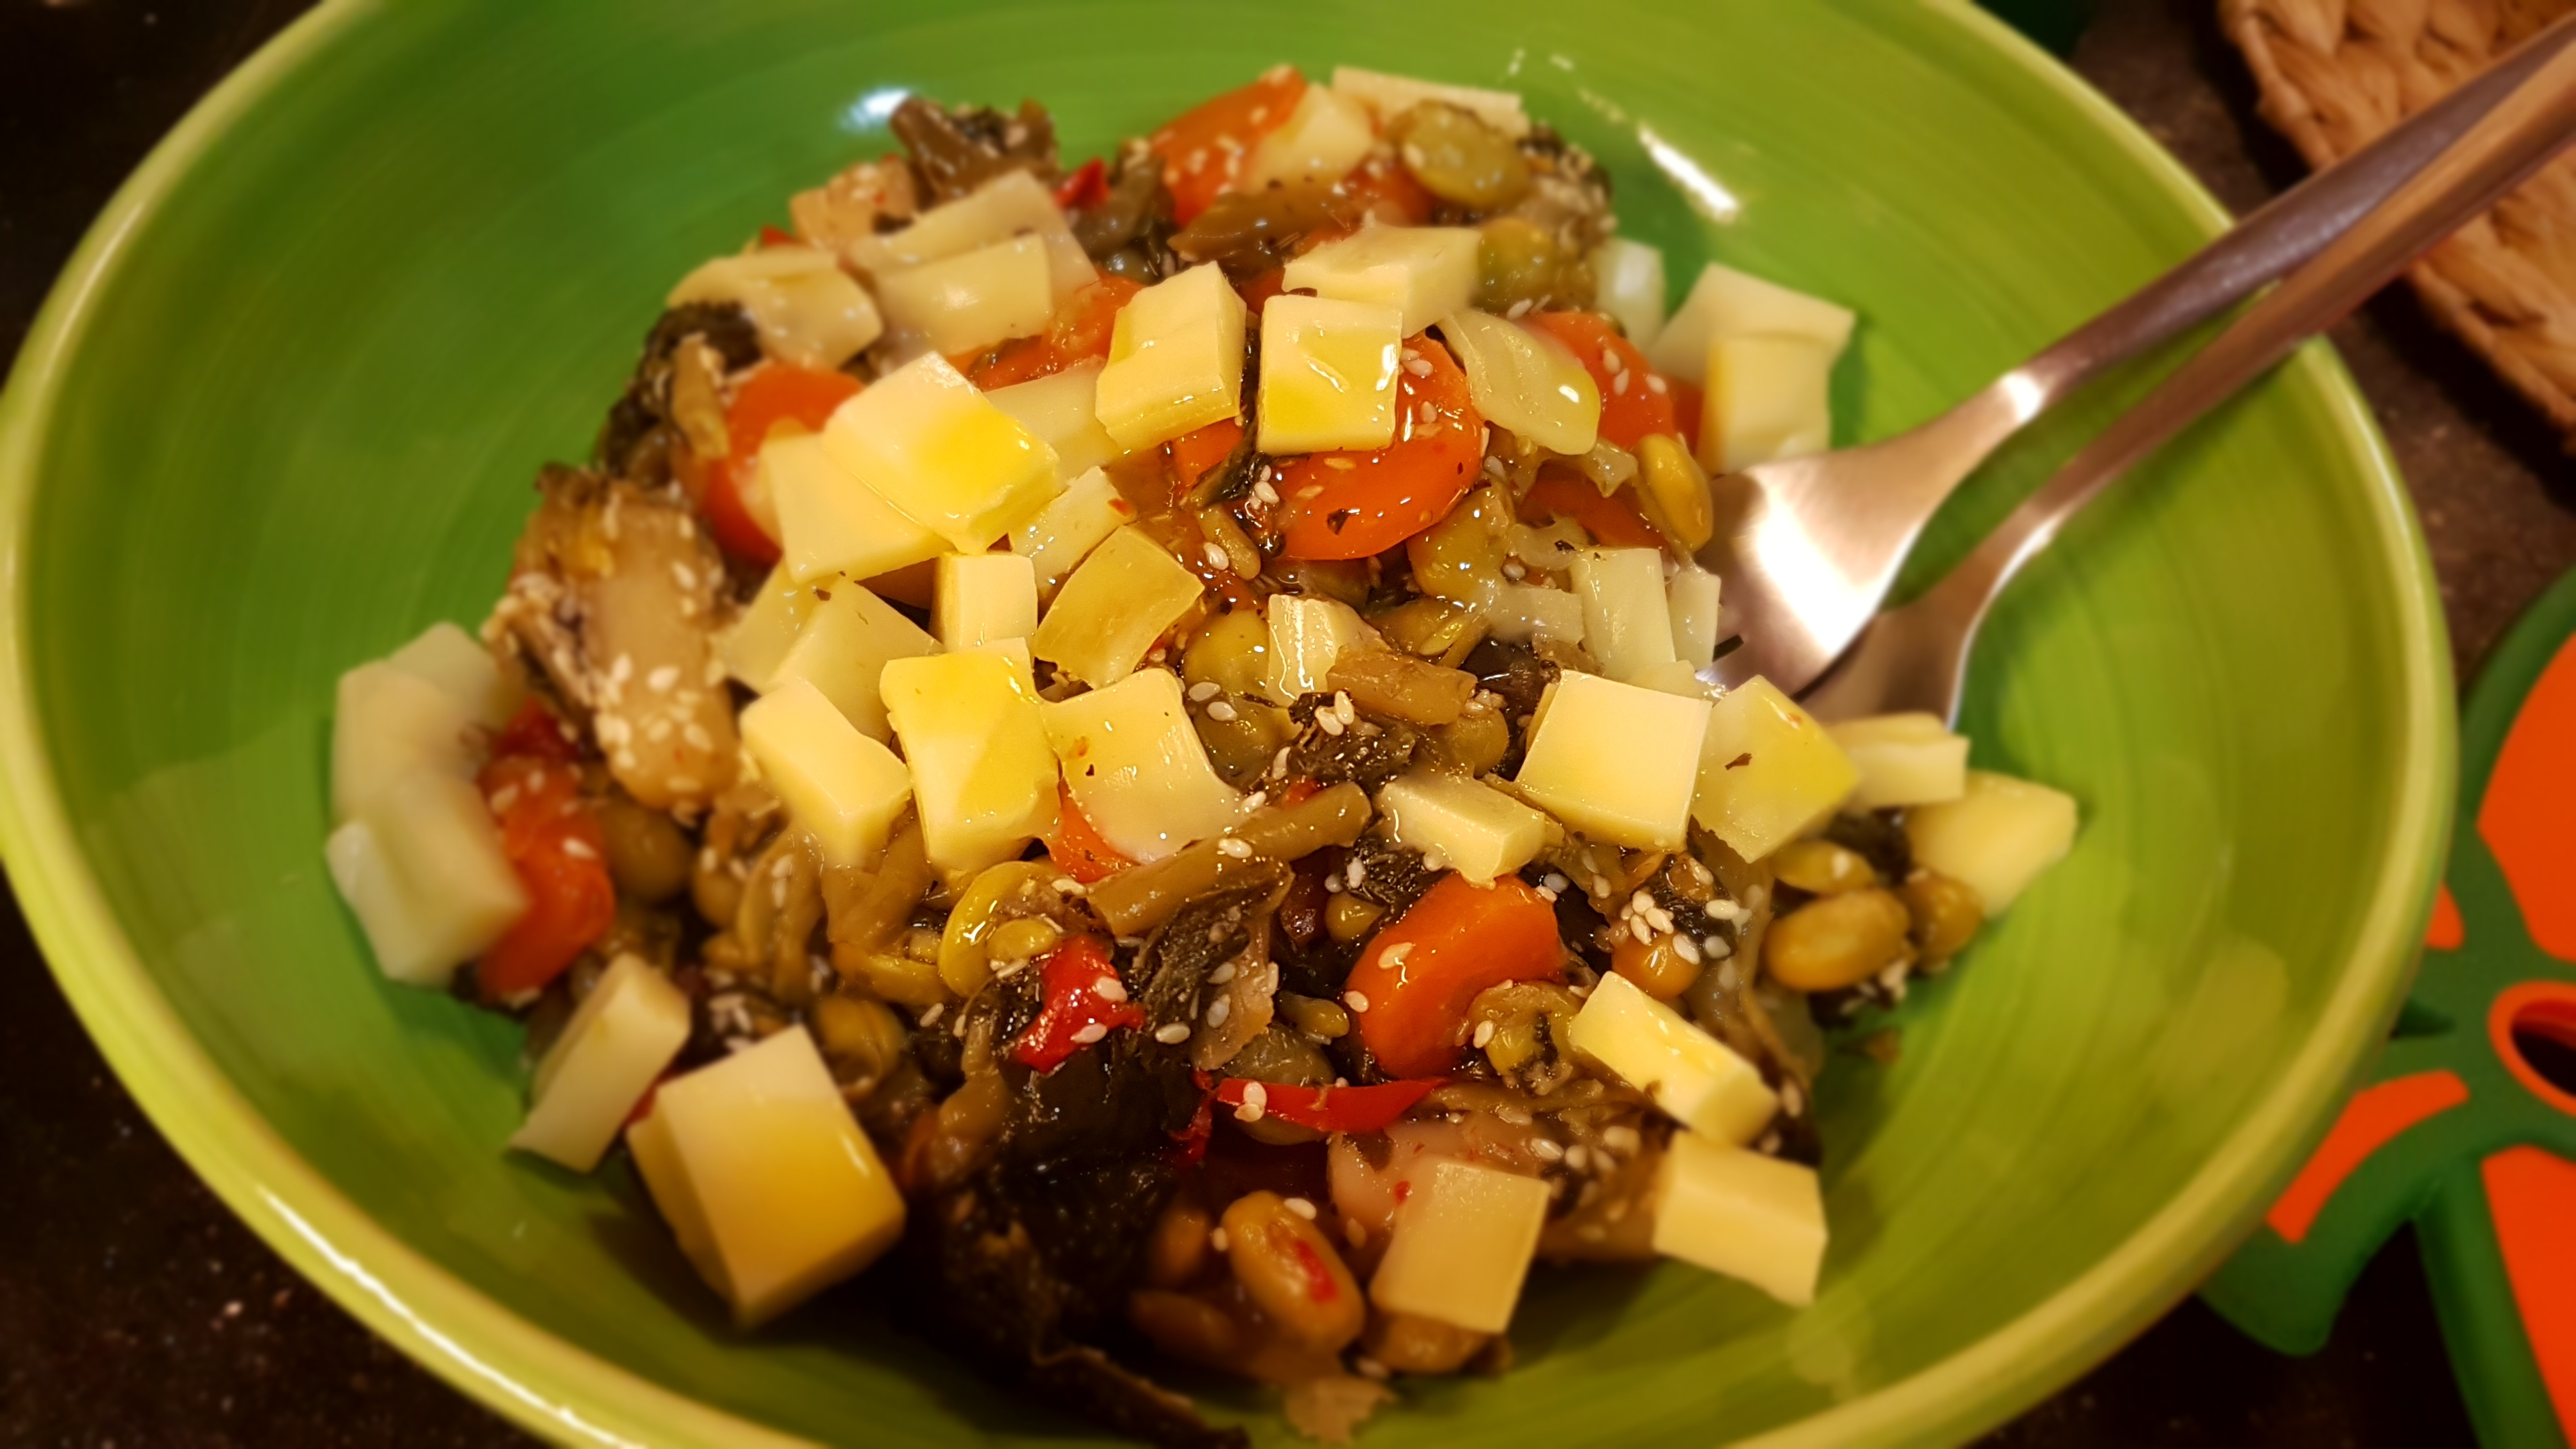 Dinner Freshness Salad  بالعافیه